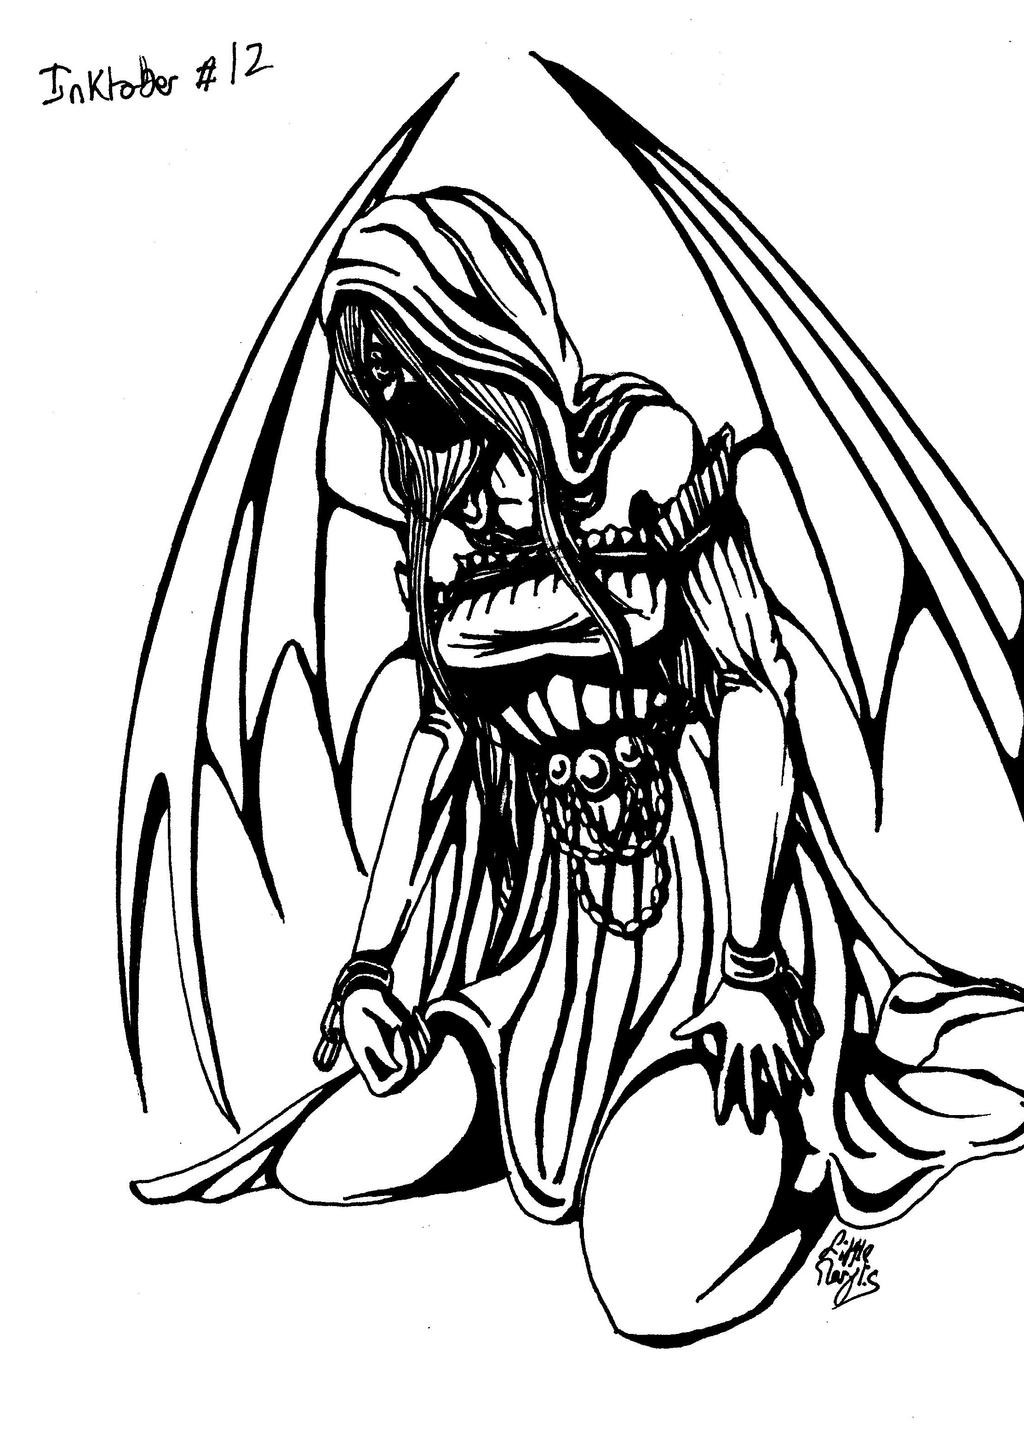 Inktober #12 - Angel's Hades by ALittleLady